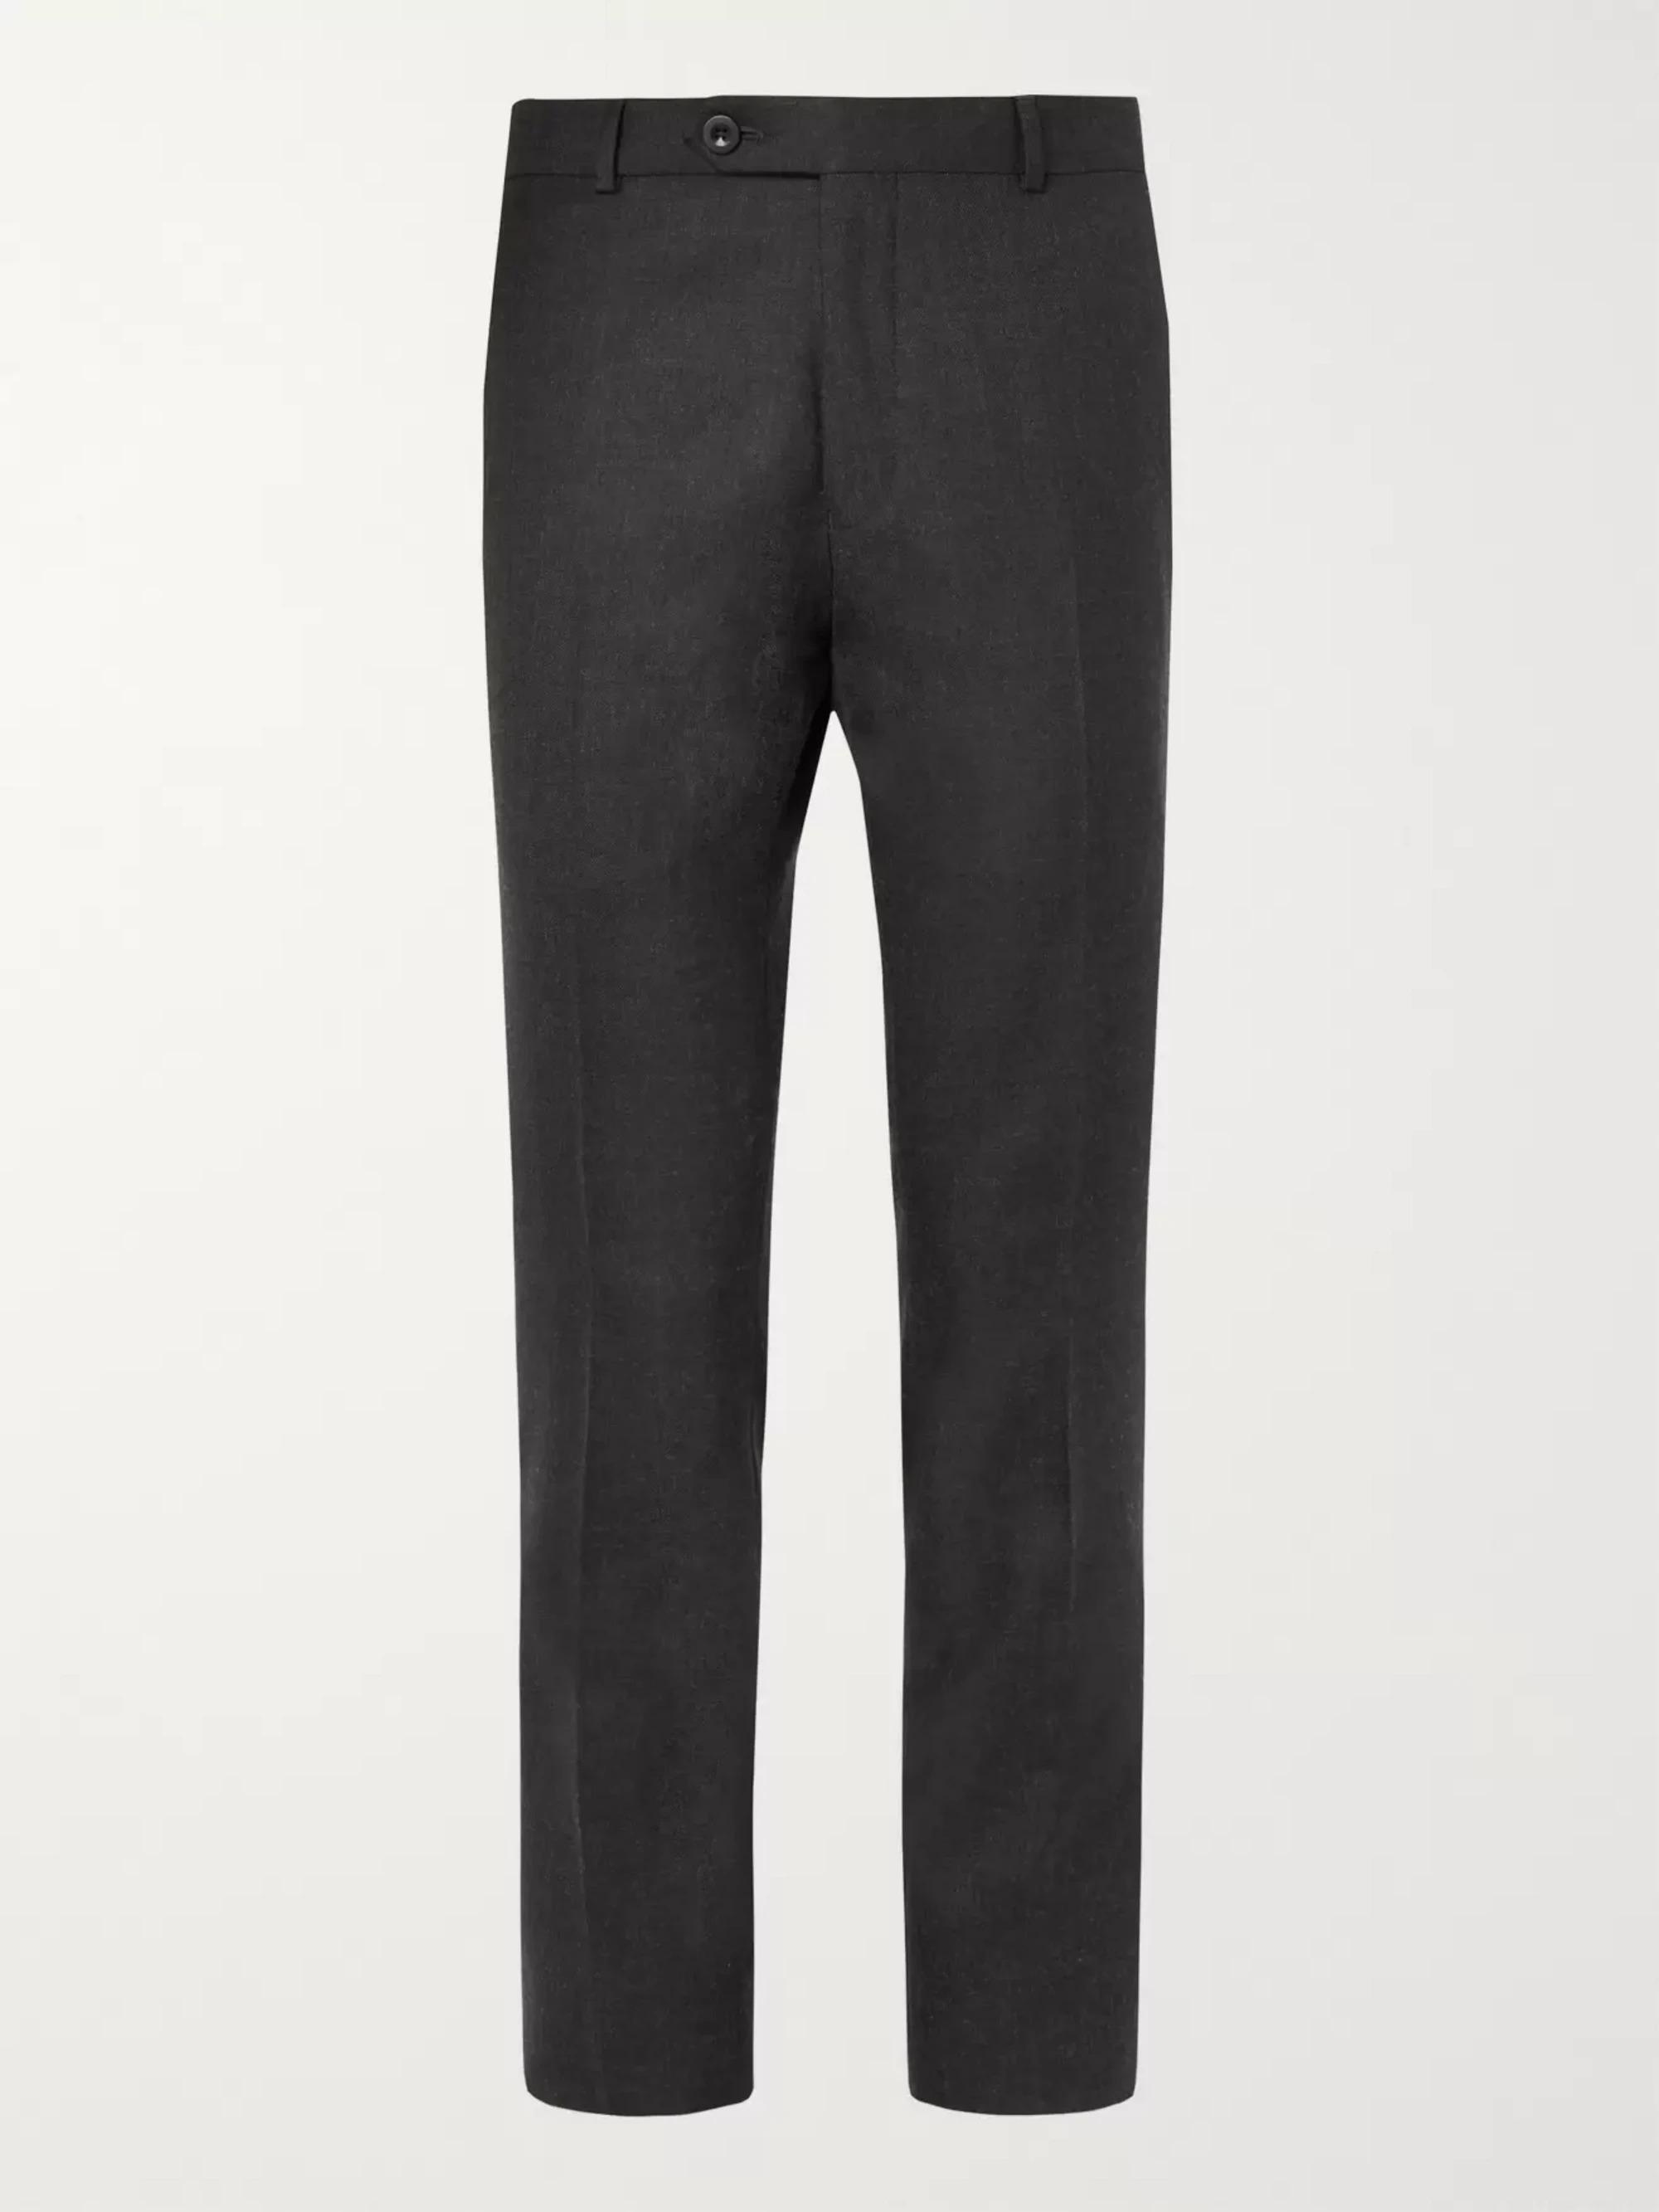 Mr. P Slim Fit Grey Worsted Wool Trousers; men's dress pants